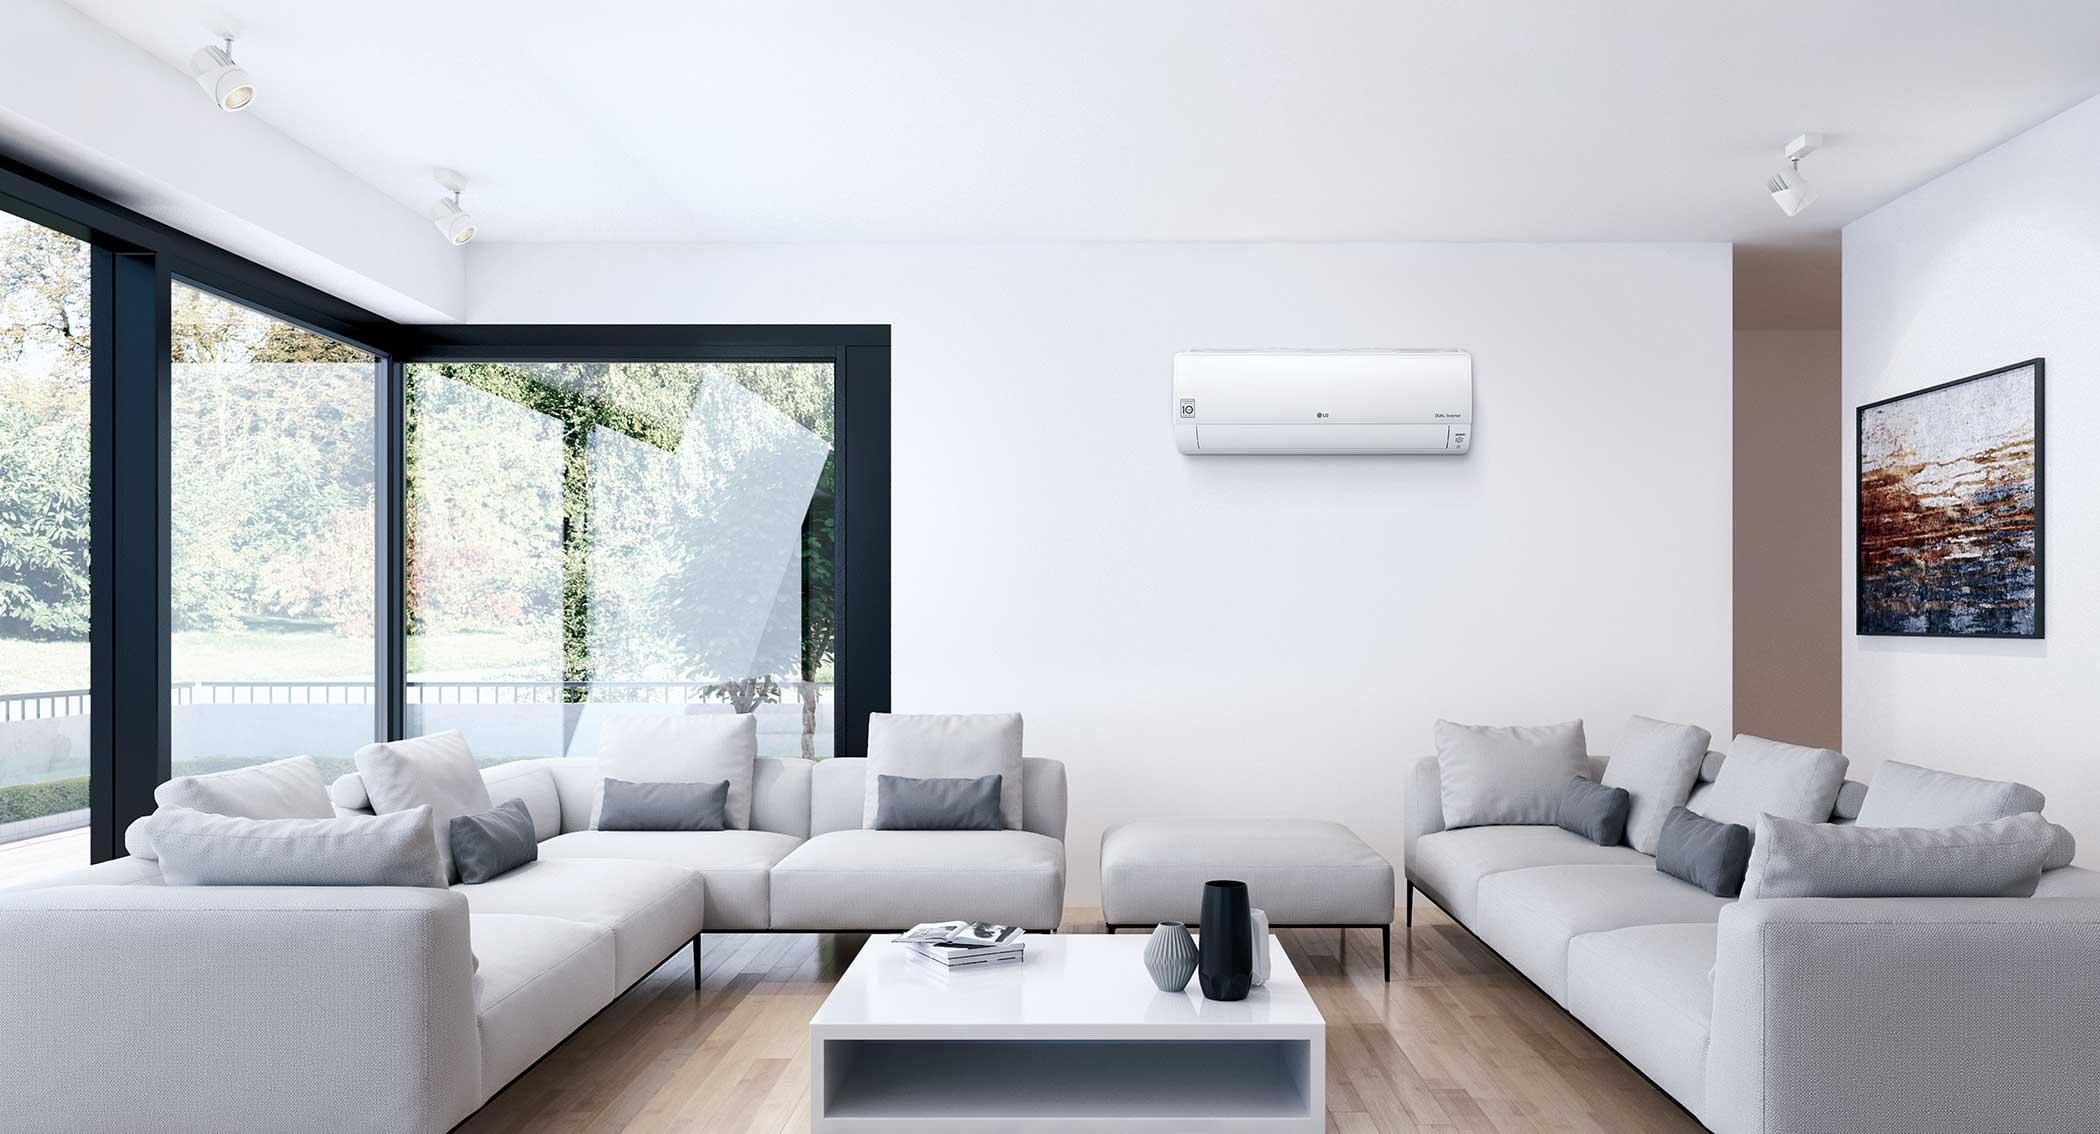 Een airco in uw living? | QuickAir - airco-installateur in Limburg